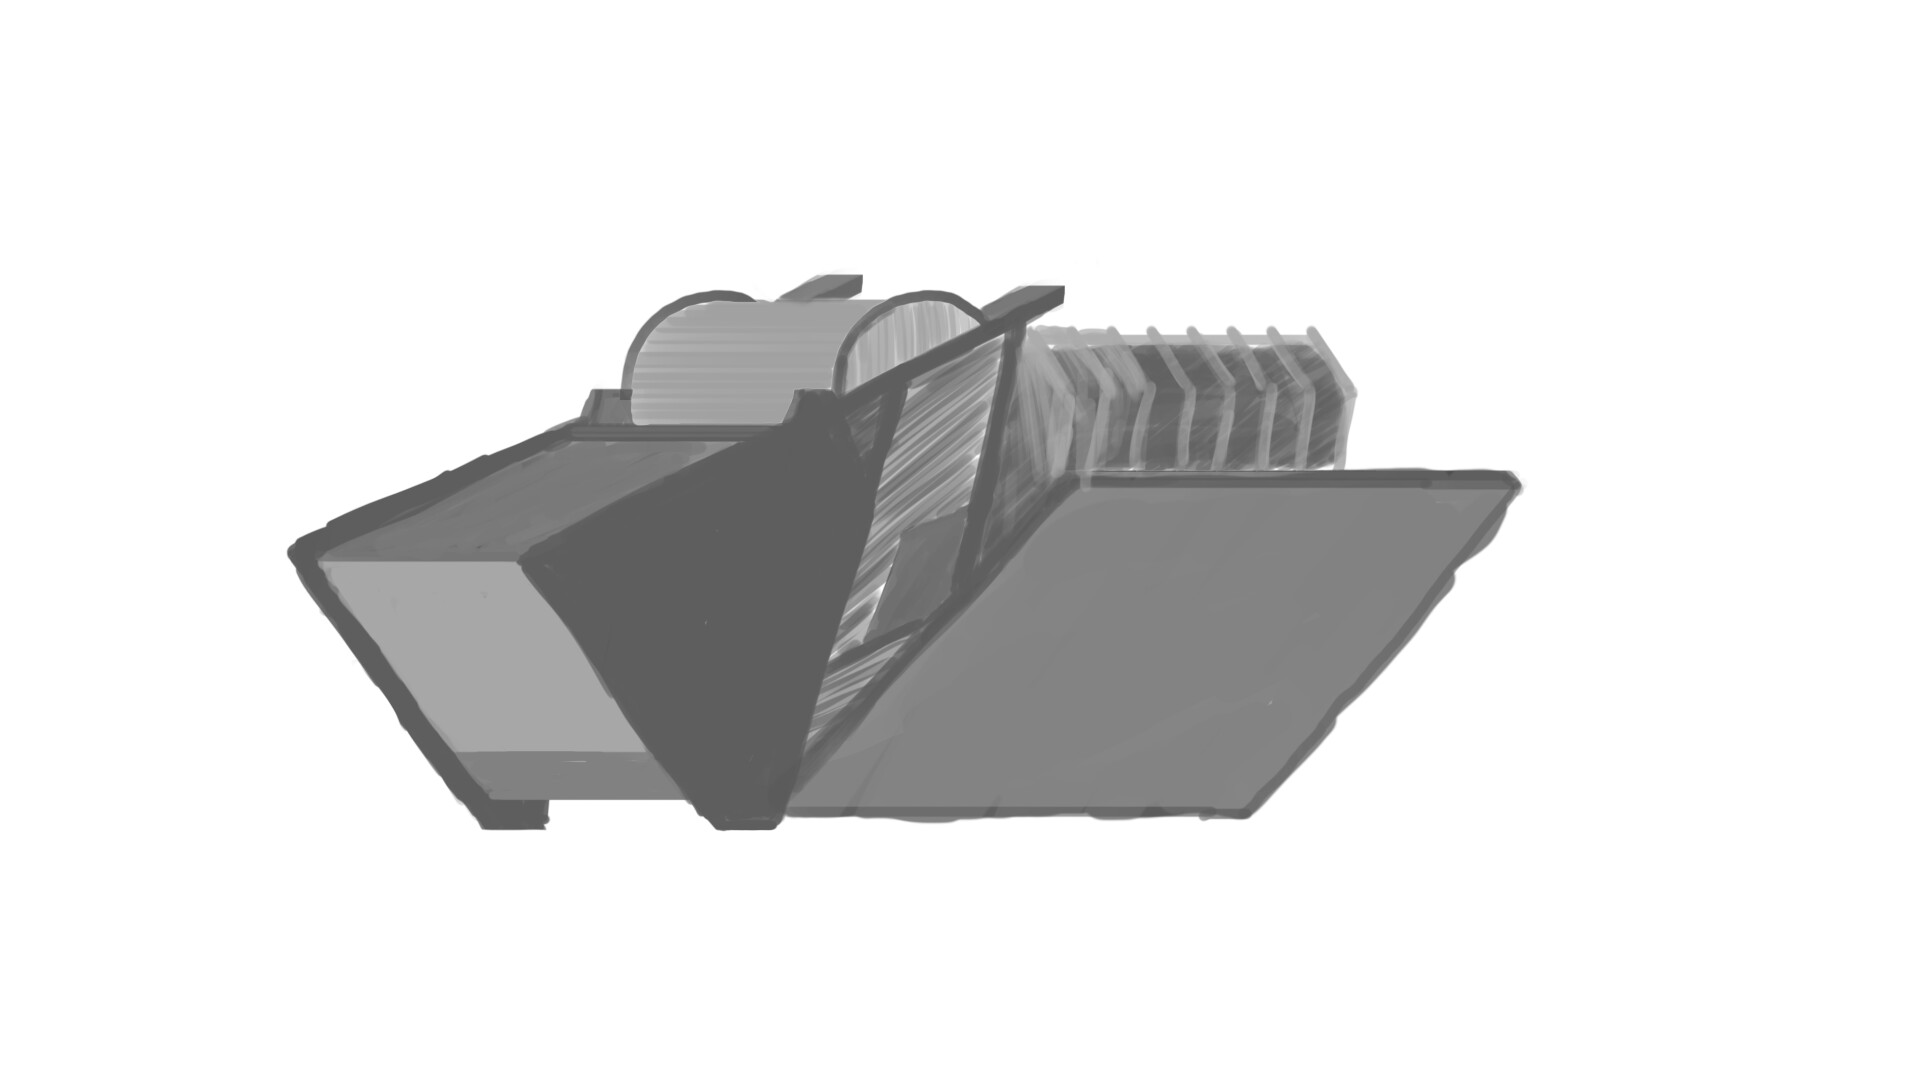 Alexander laheij ship texture and shape experimenting